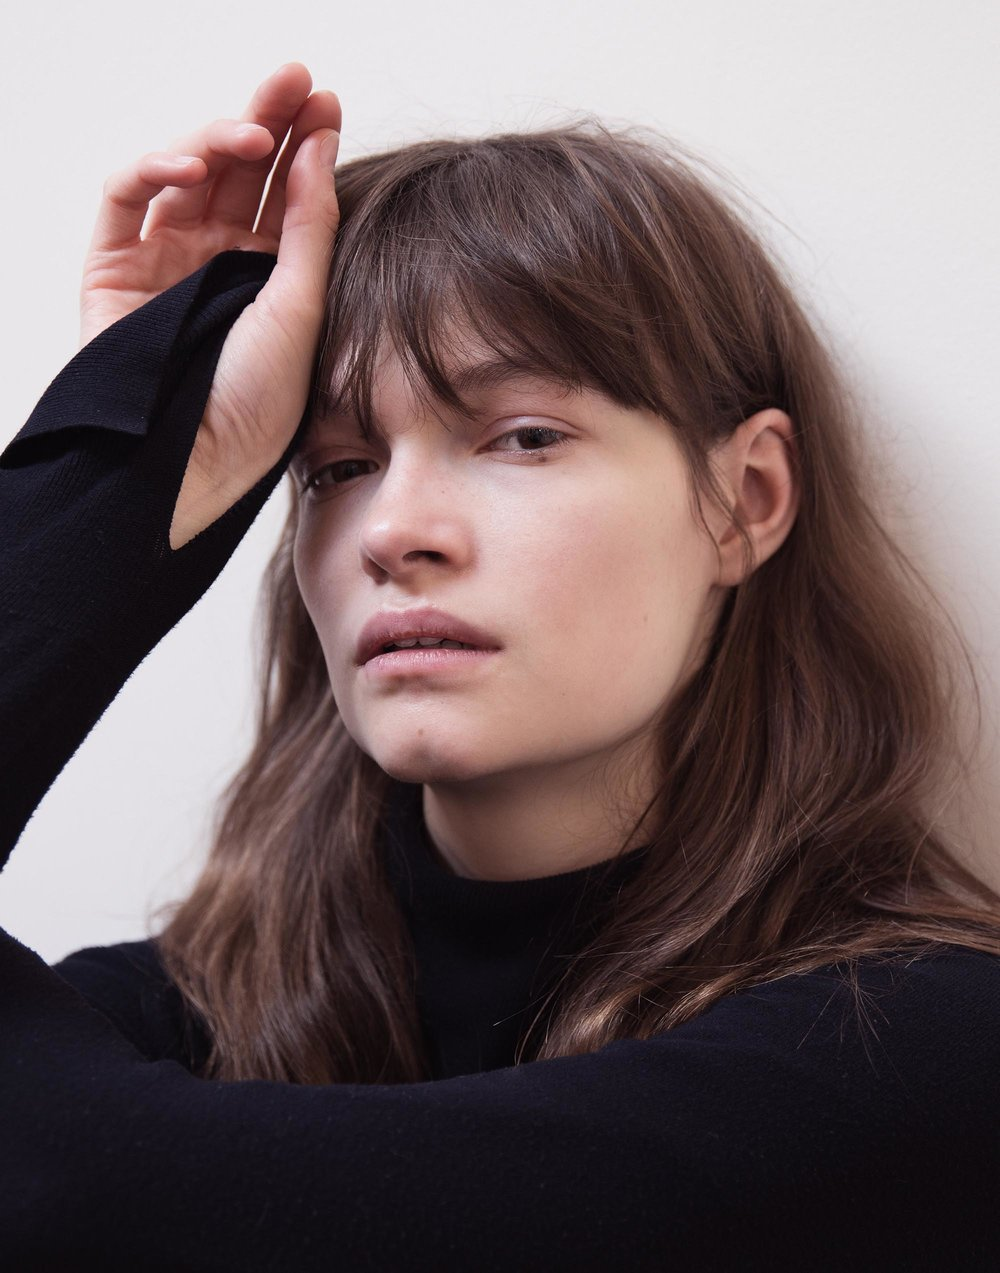 Photography  Gaia Bonanomi  Styling  Giorgia Toscani  Model  Noortje Van Hoek  Clothes  Davide Grillo